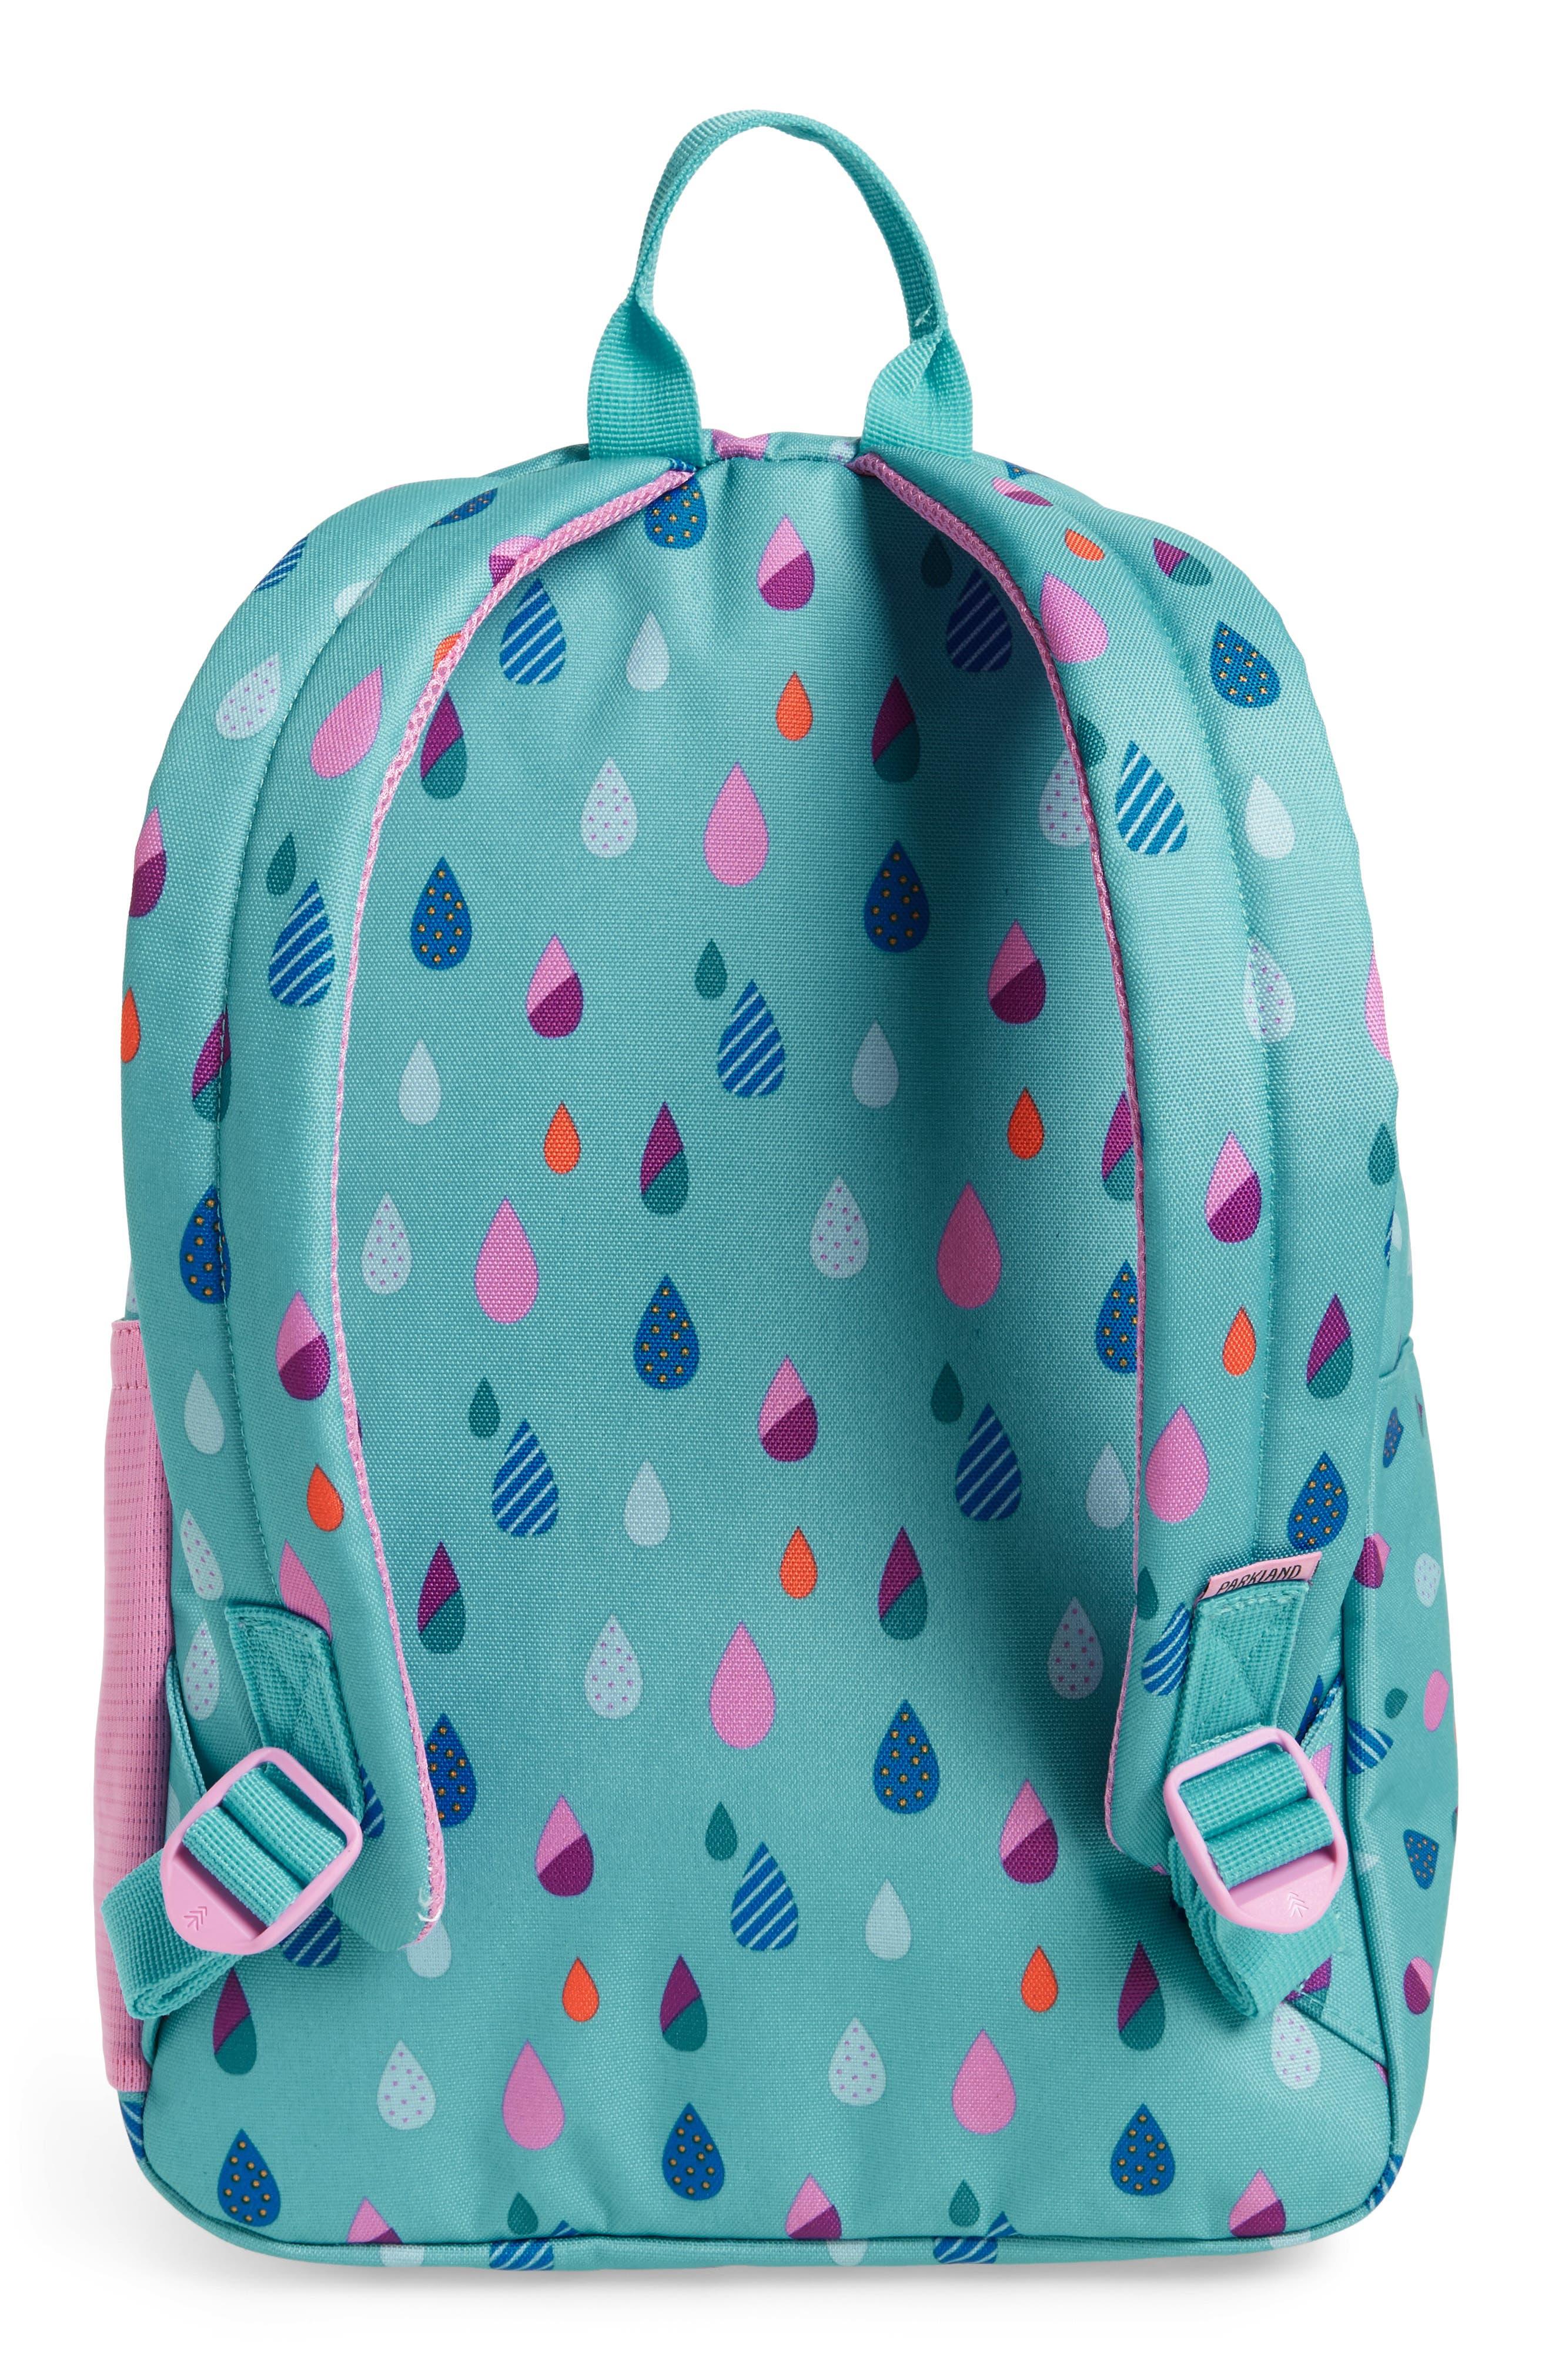 Bayside - Puddles Backpack,                             Alternate thumbnail 2, color,                             Blue